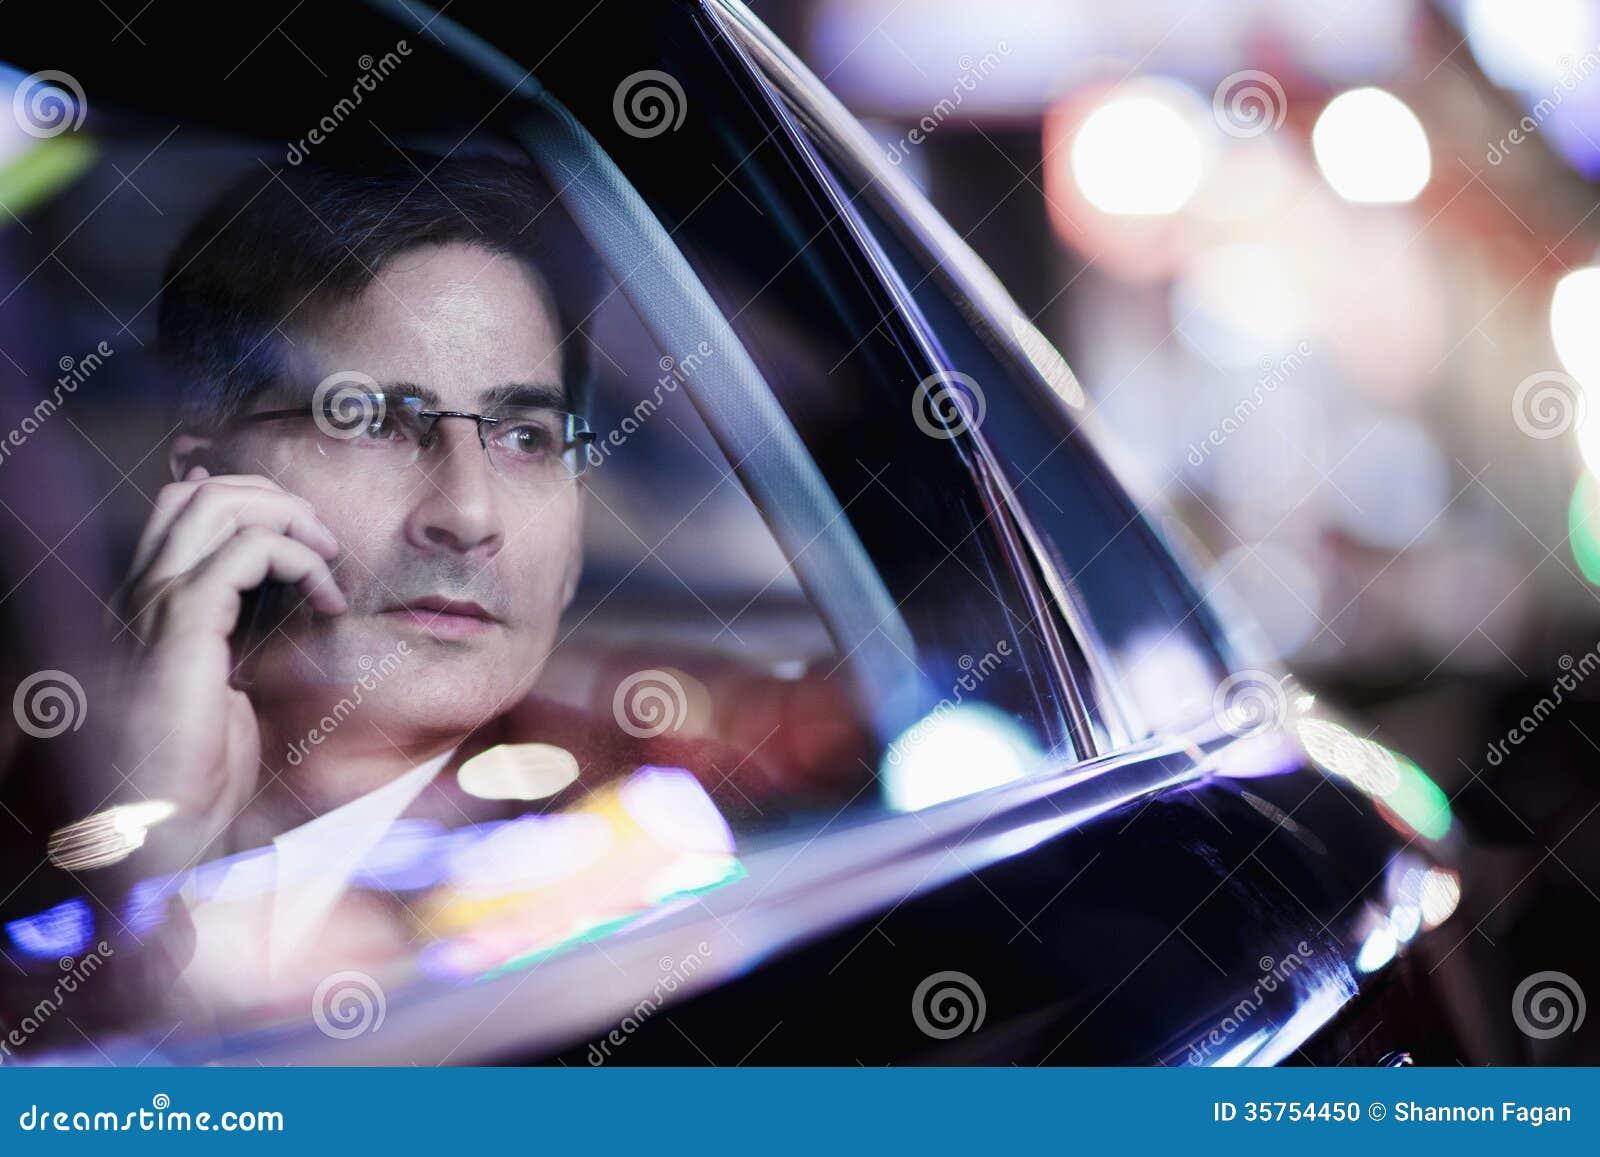 looking out car window wwwpixsharkcom images